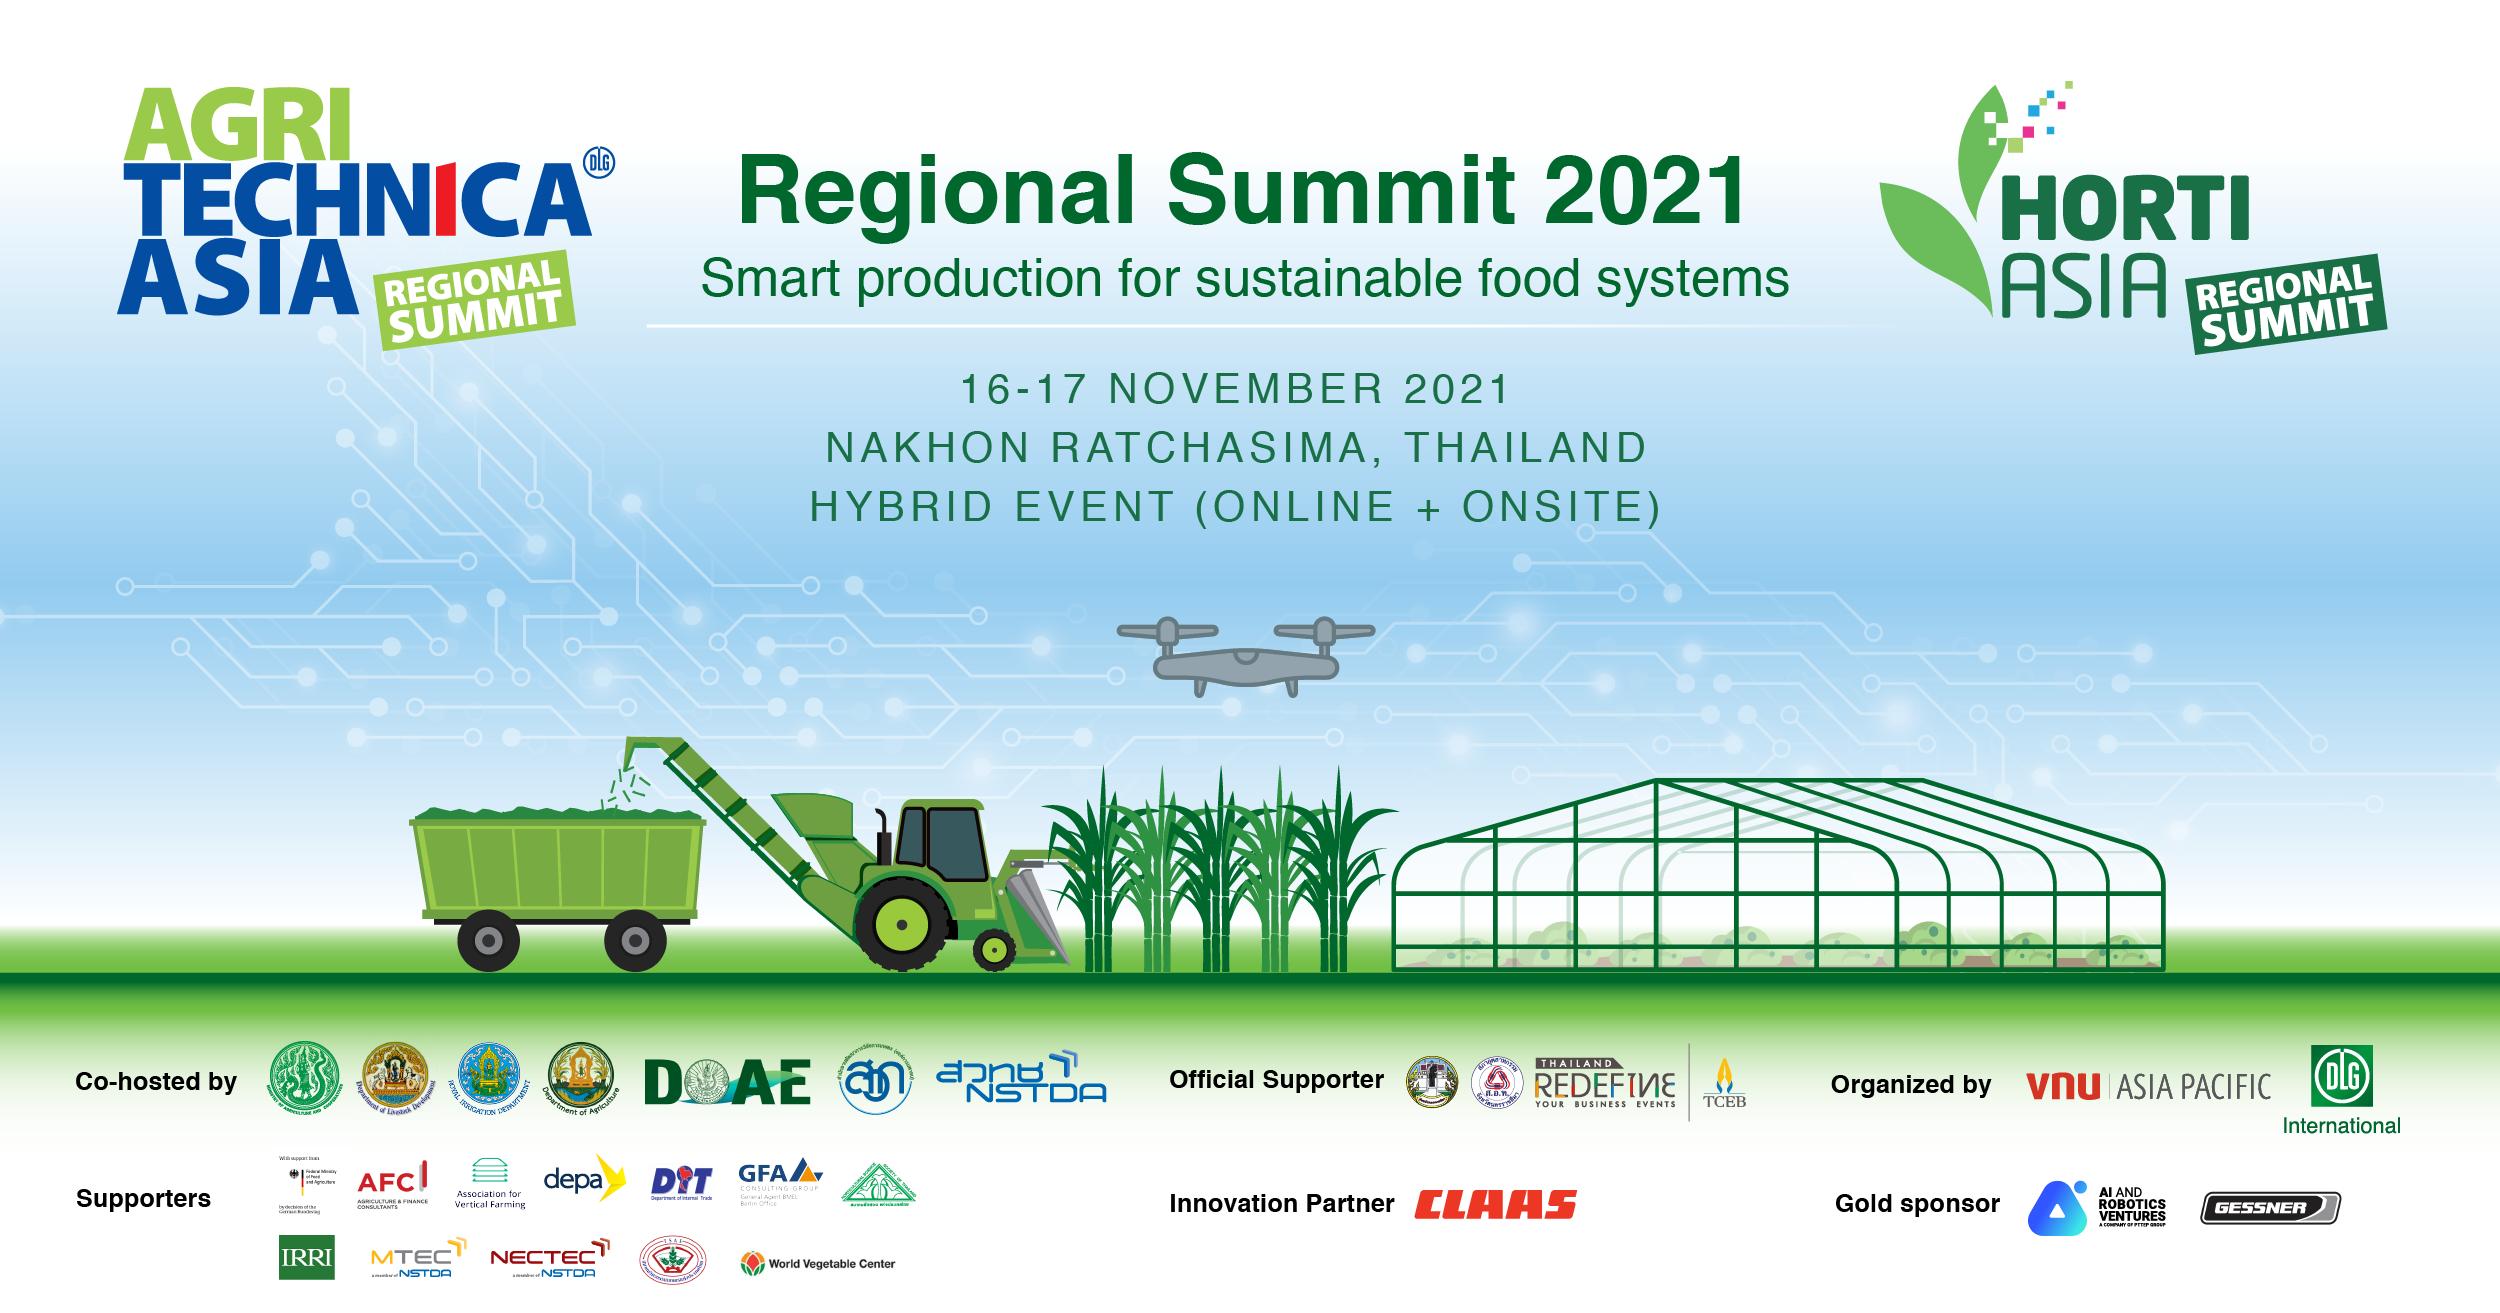 Regional Summit 2021